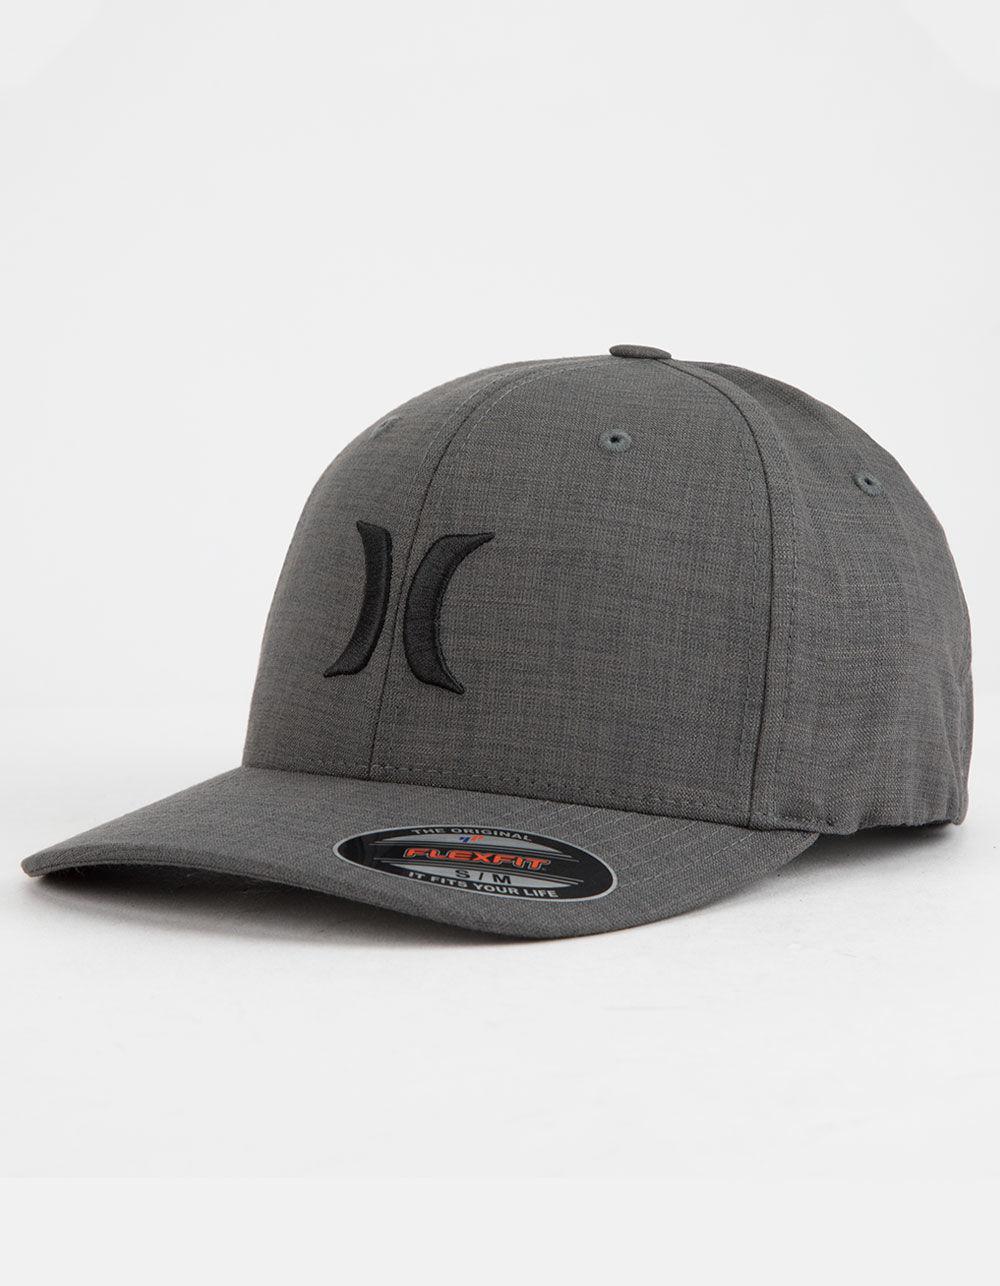 quality design 239cc 59916 Hurley. Textures Flex Fit Black Mens Hat